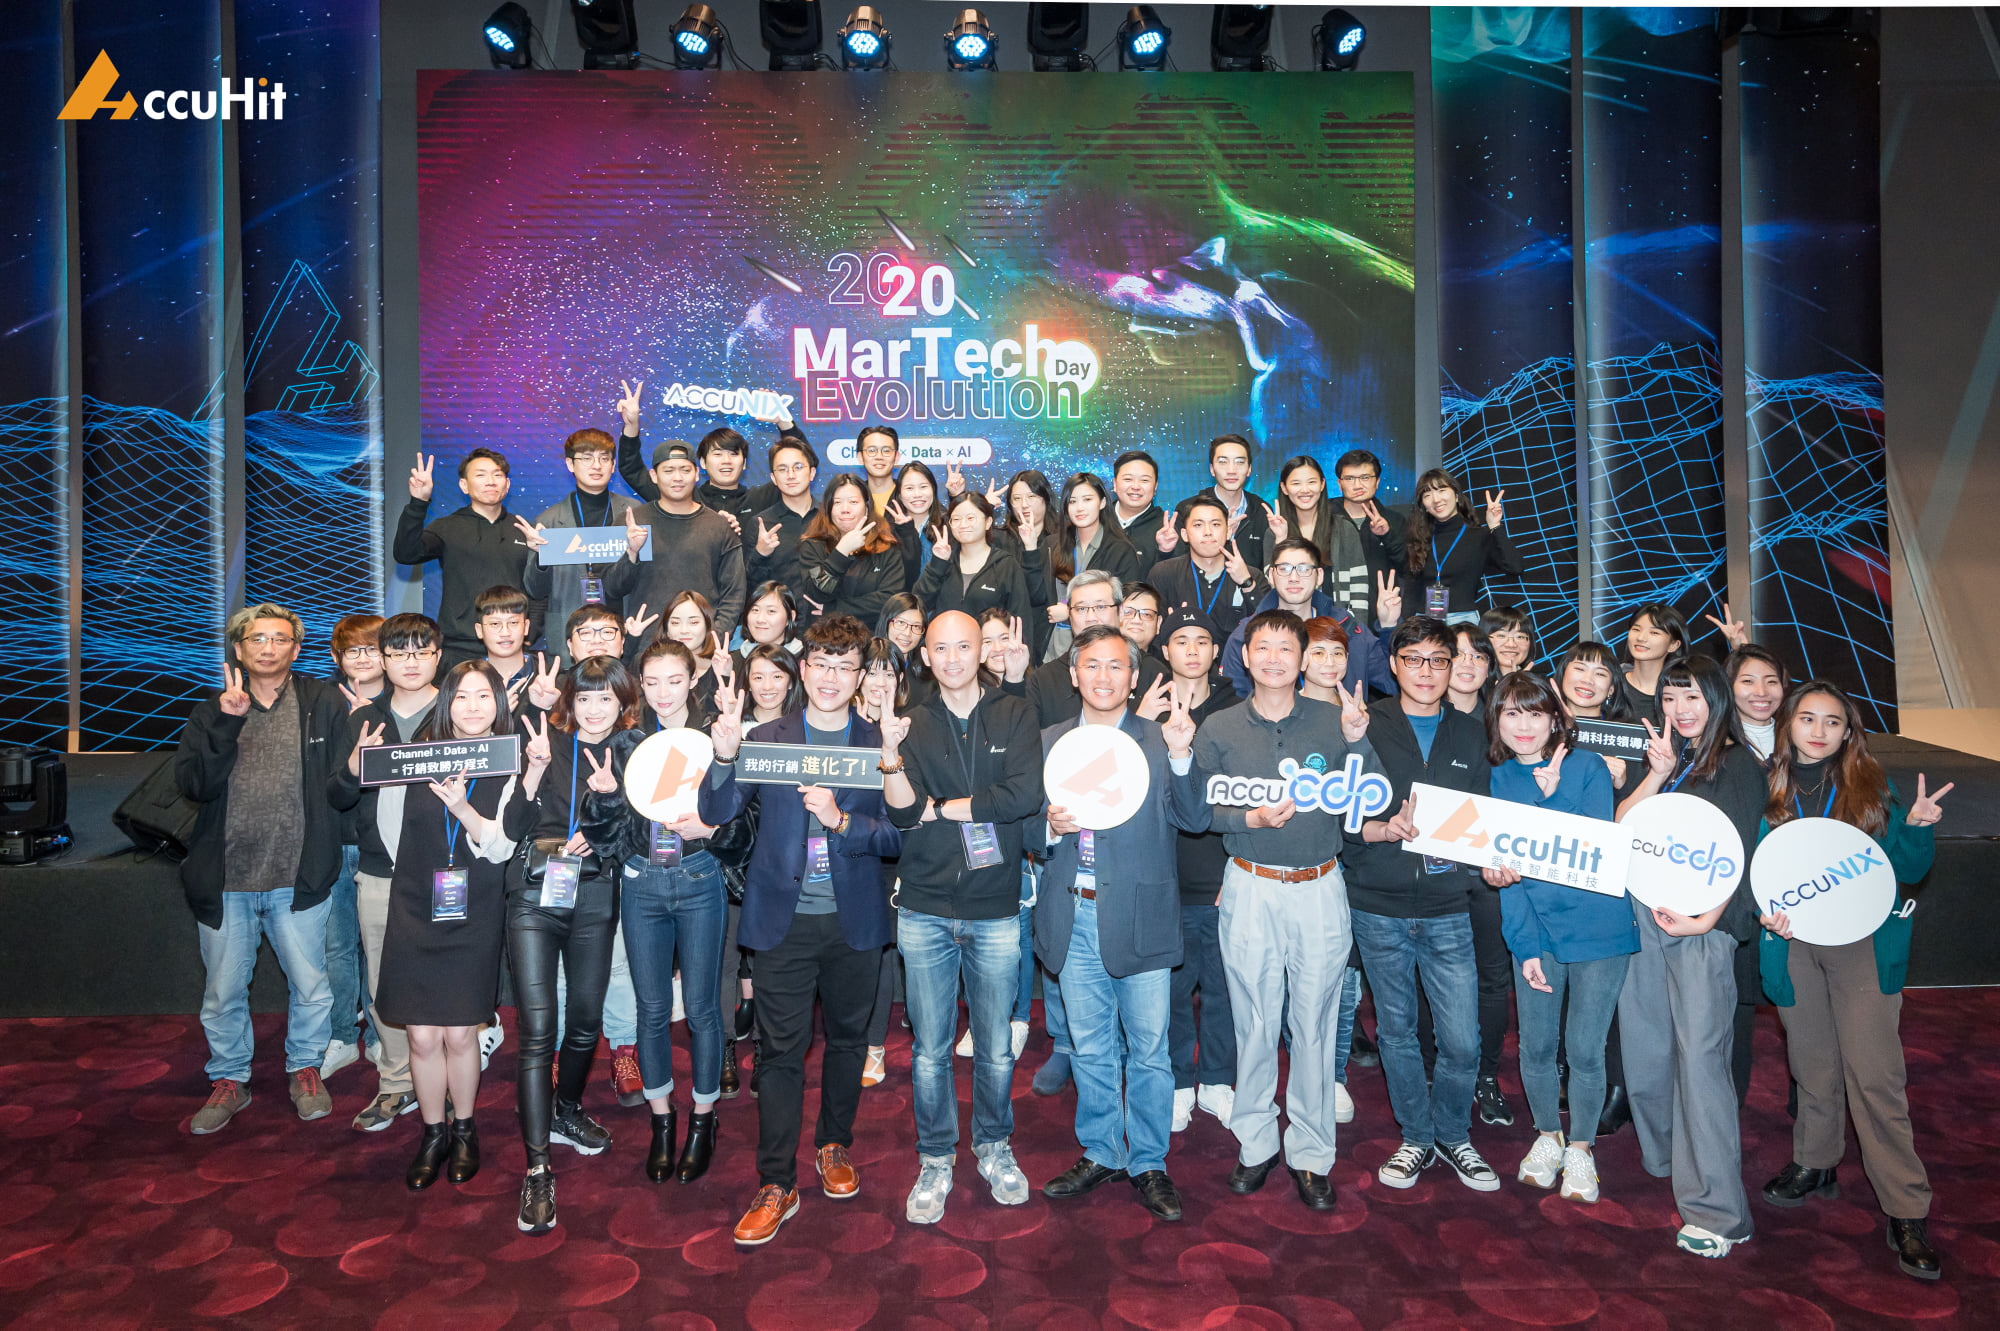 MarTech生態圈,加速行銷產業數位轉型